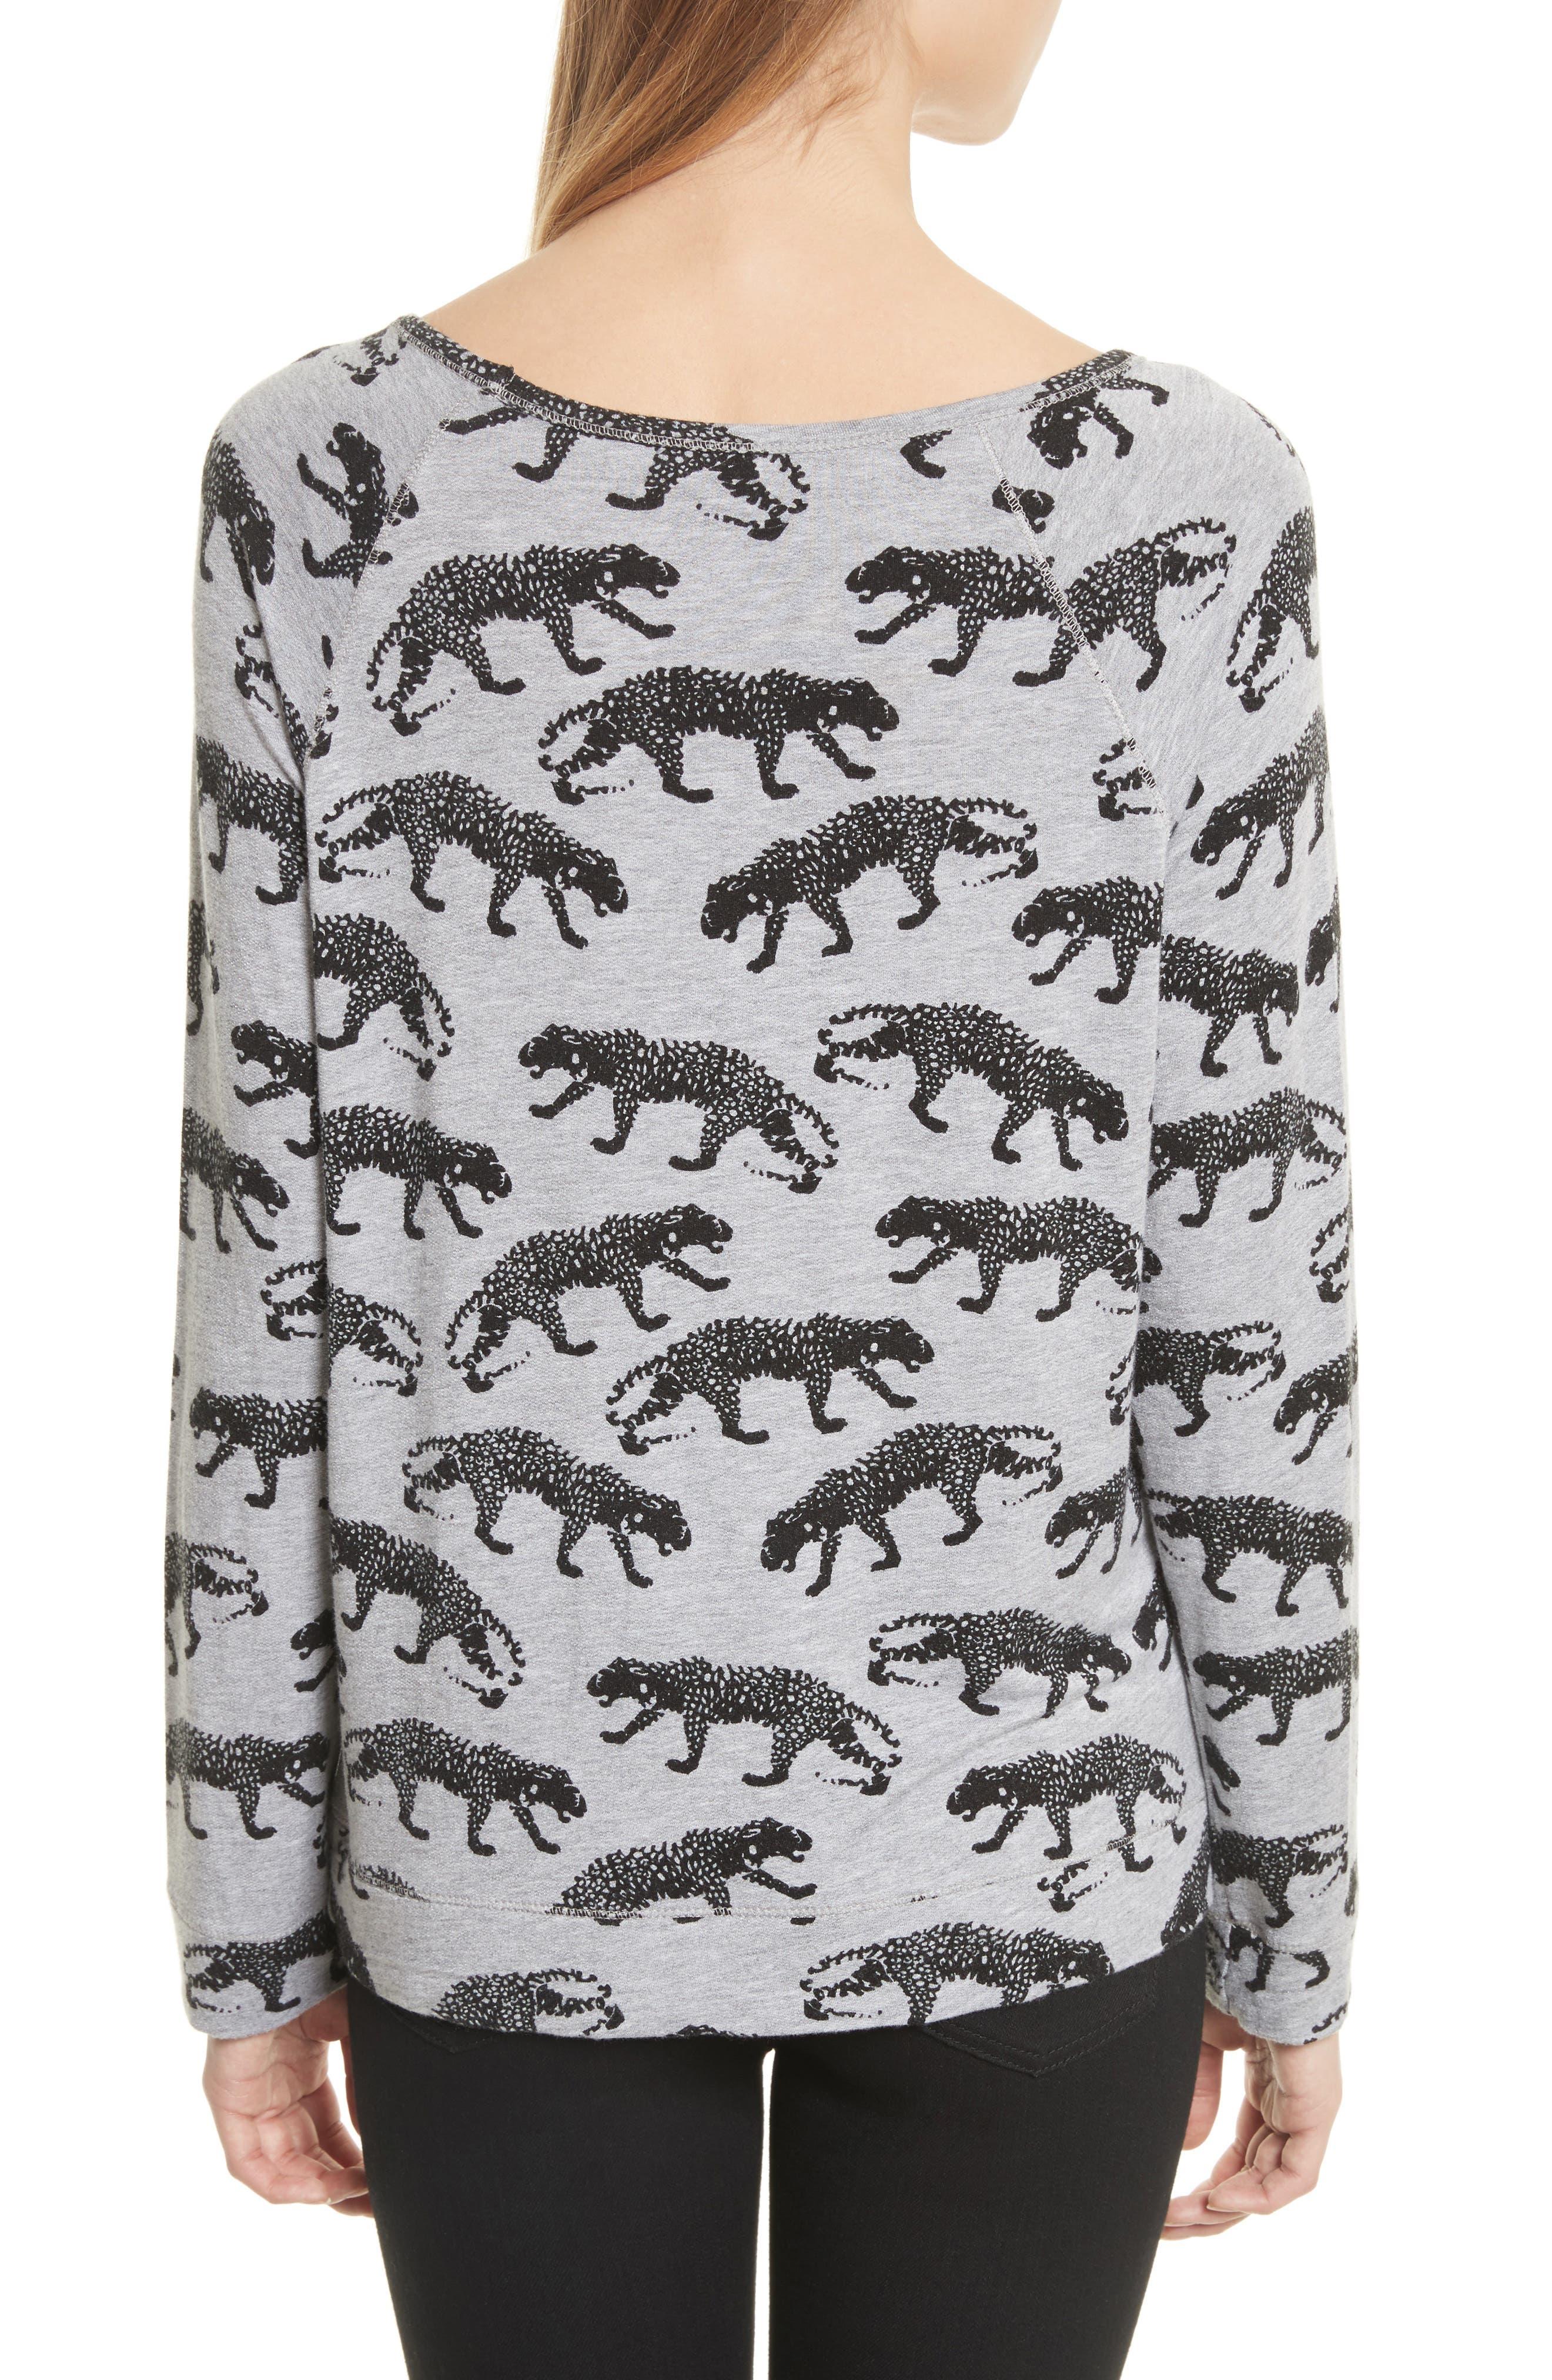 Annora B Animal Print Sweatshirt,                             Alternate thumbnail 2, color,                             033